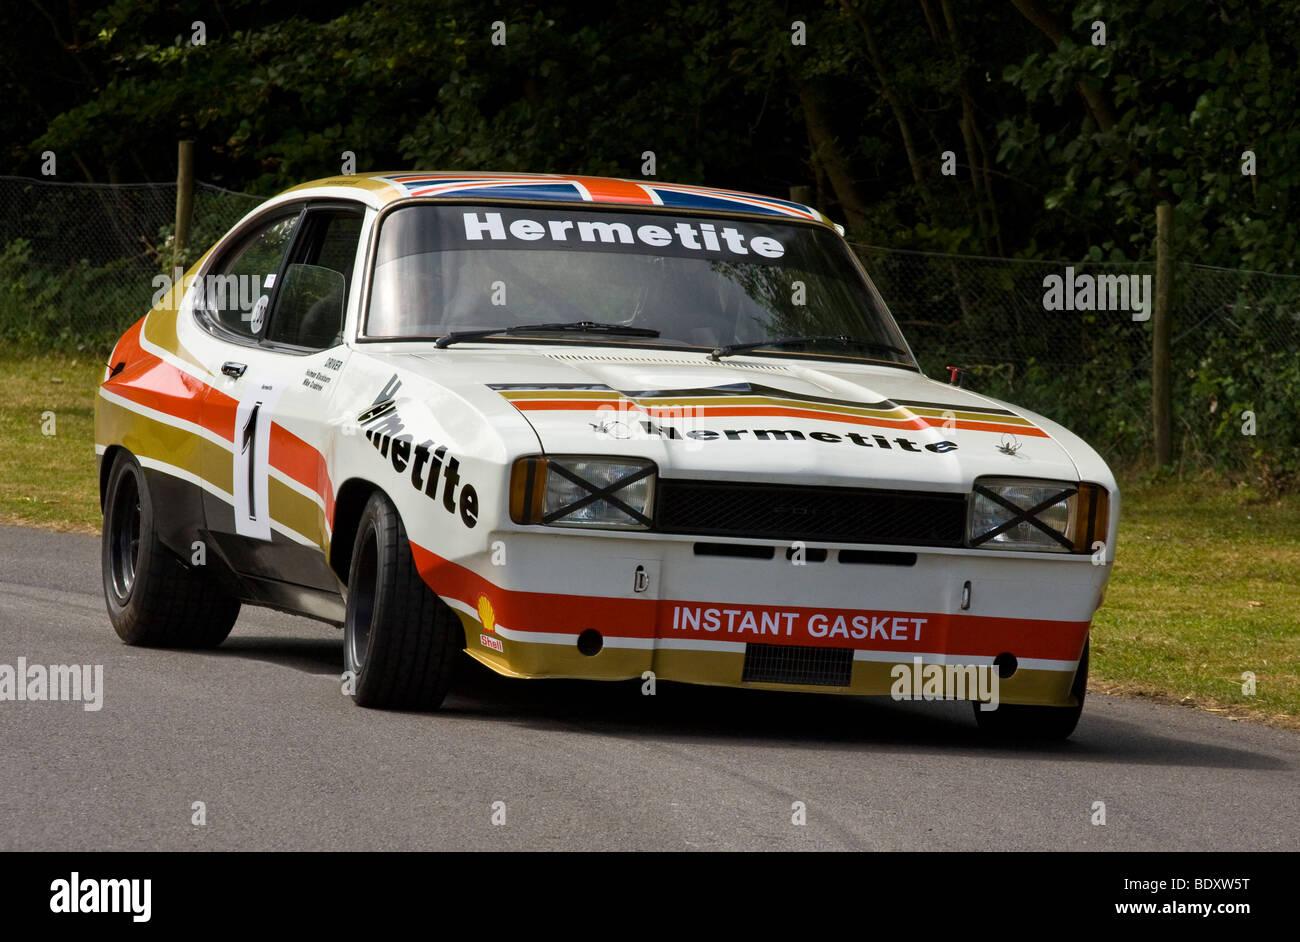 1974 Hermetite Ford Capri Mk2 3000 Gt With Driver Holman